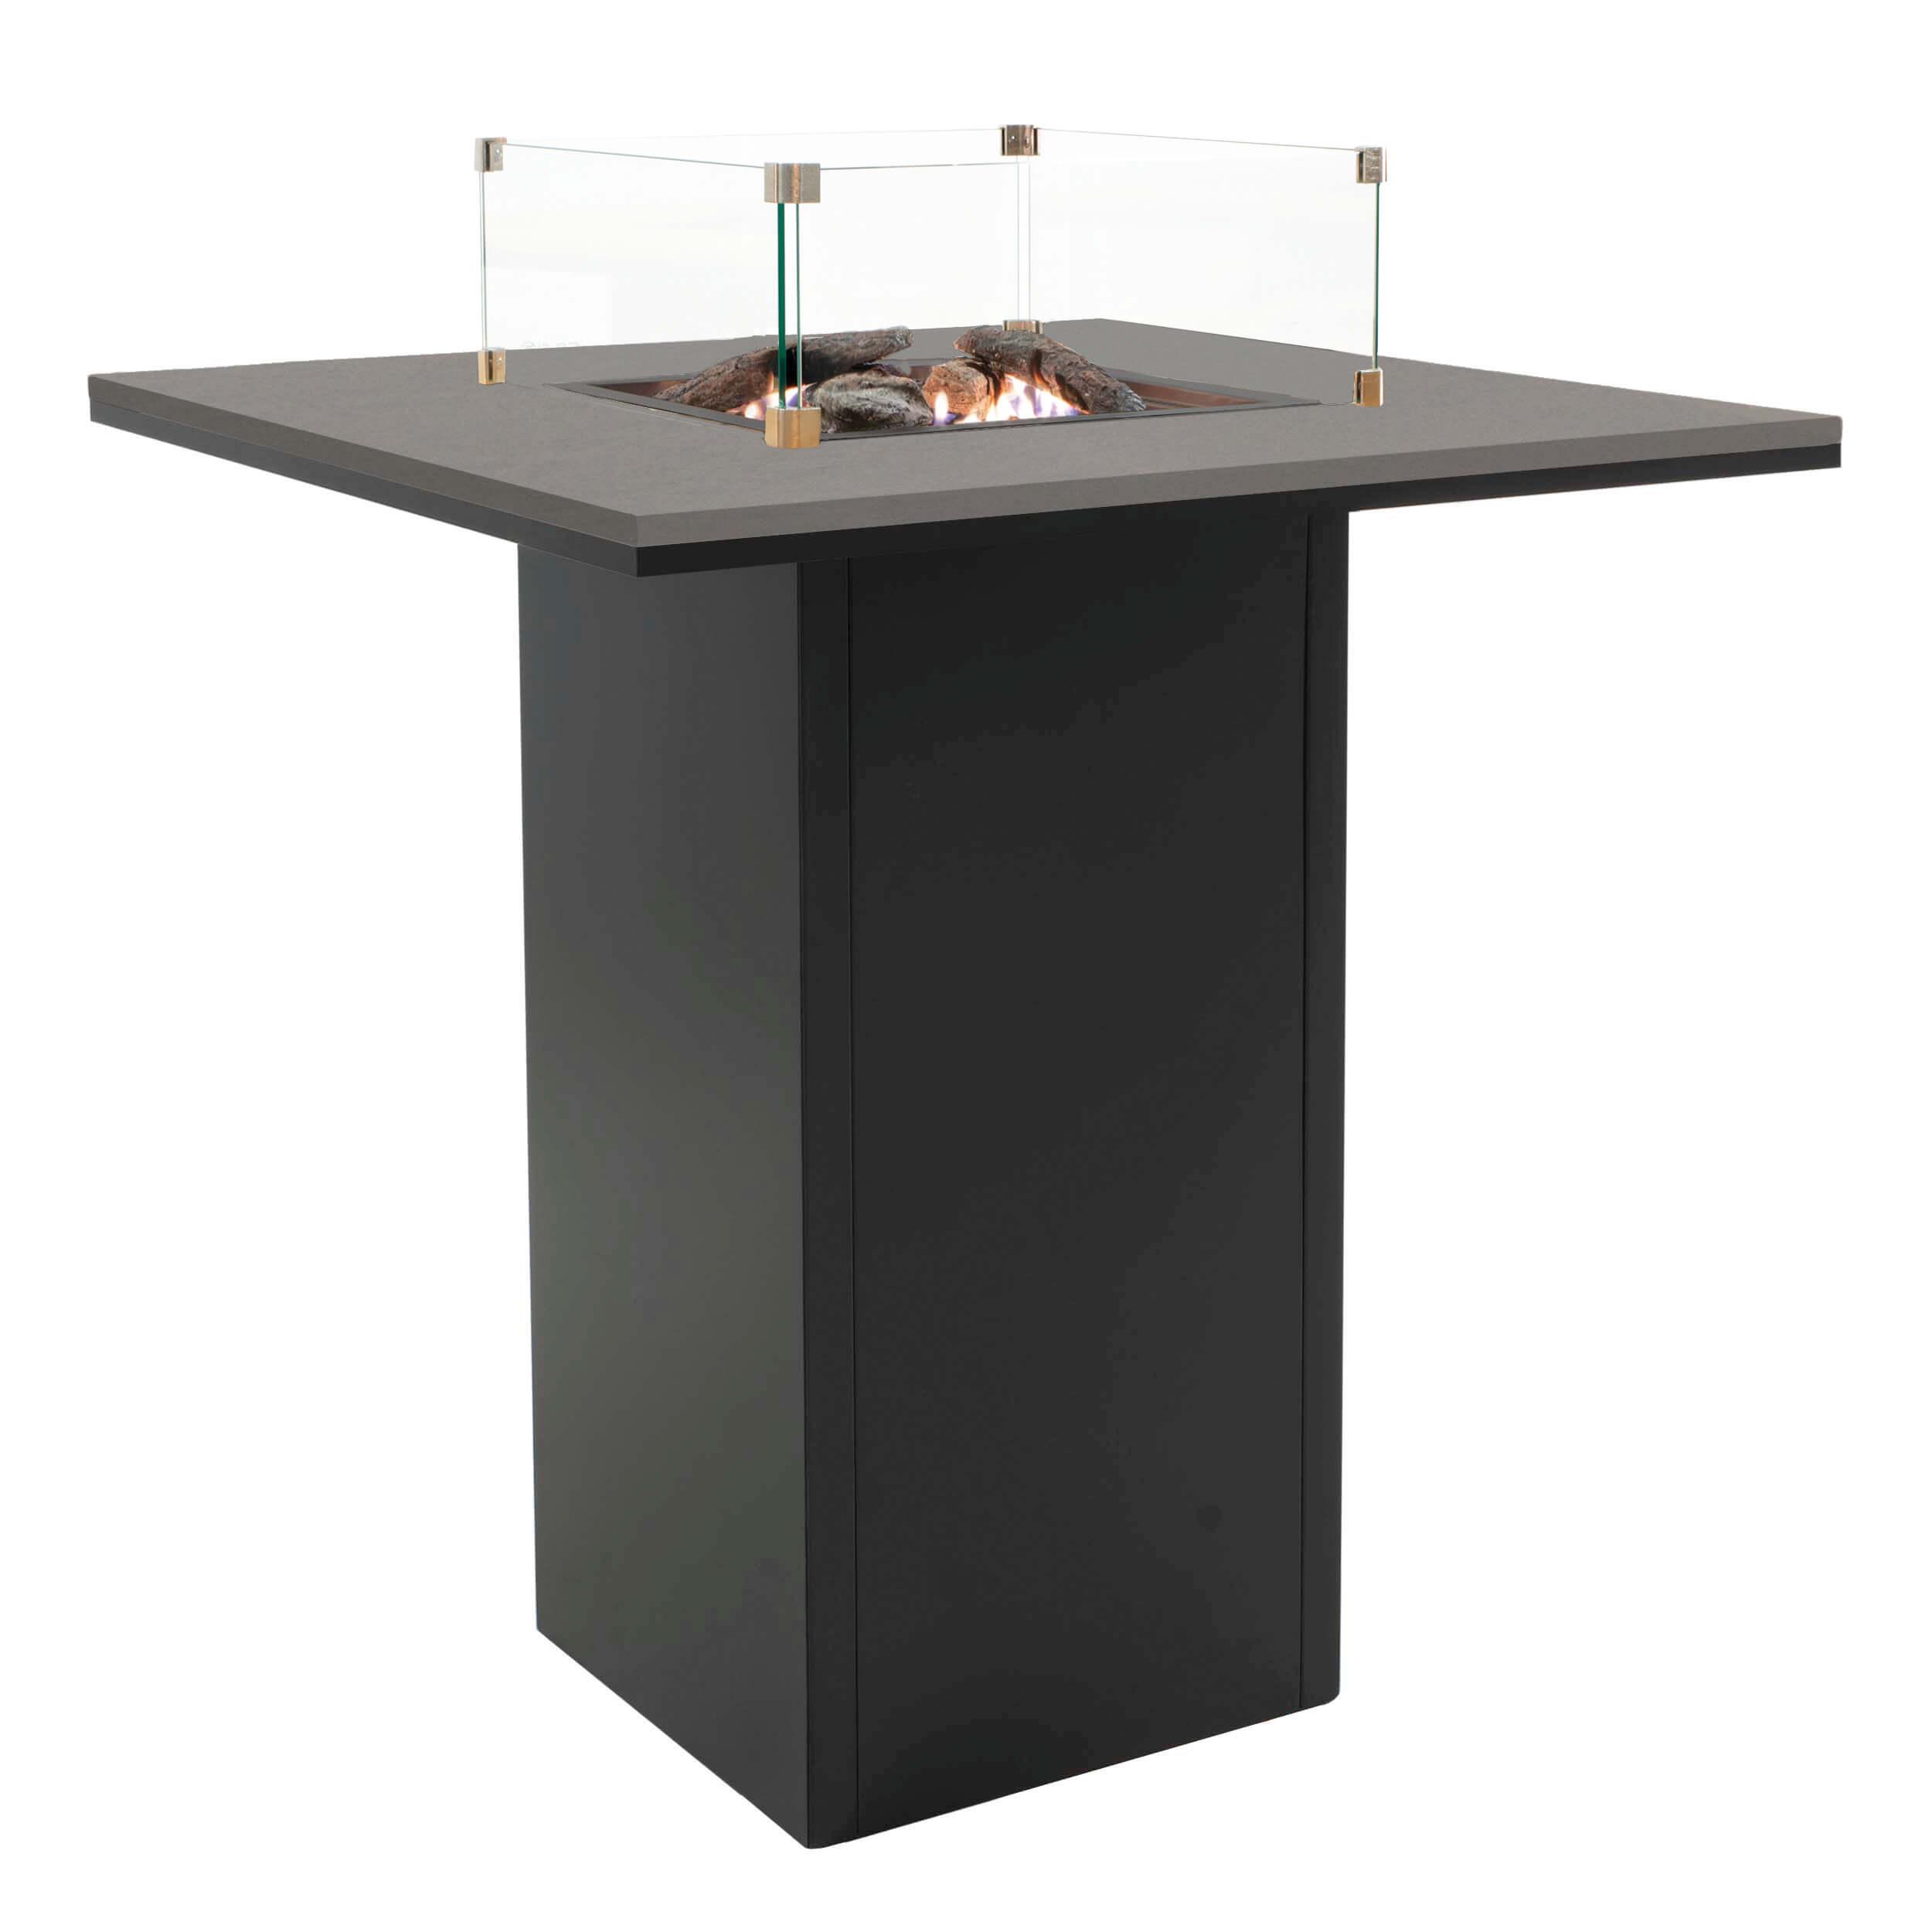 Cosiloft 100 Bar Table Sort-Grå